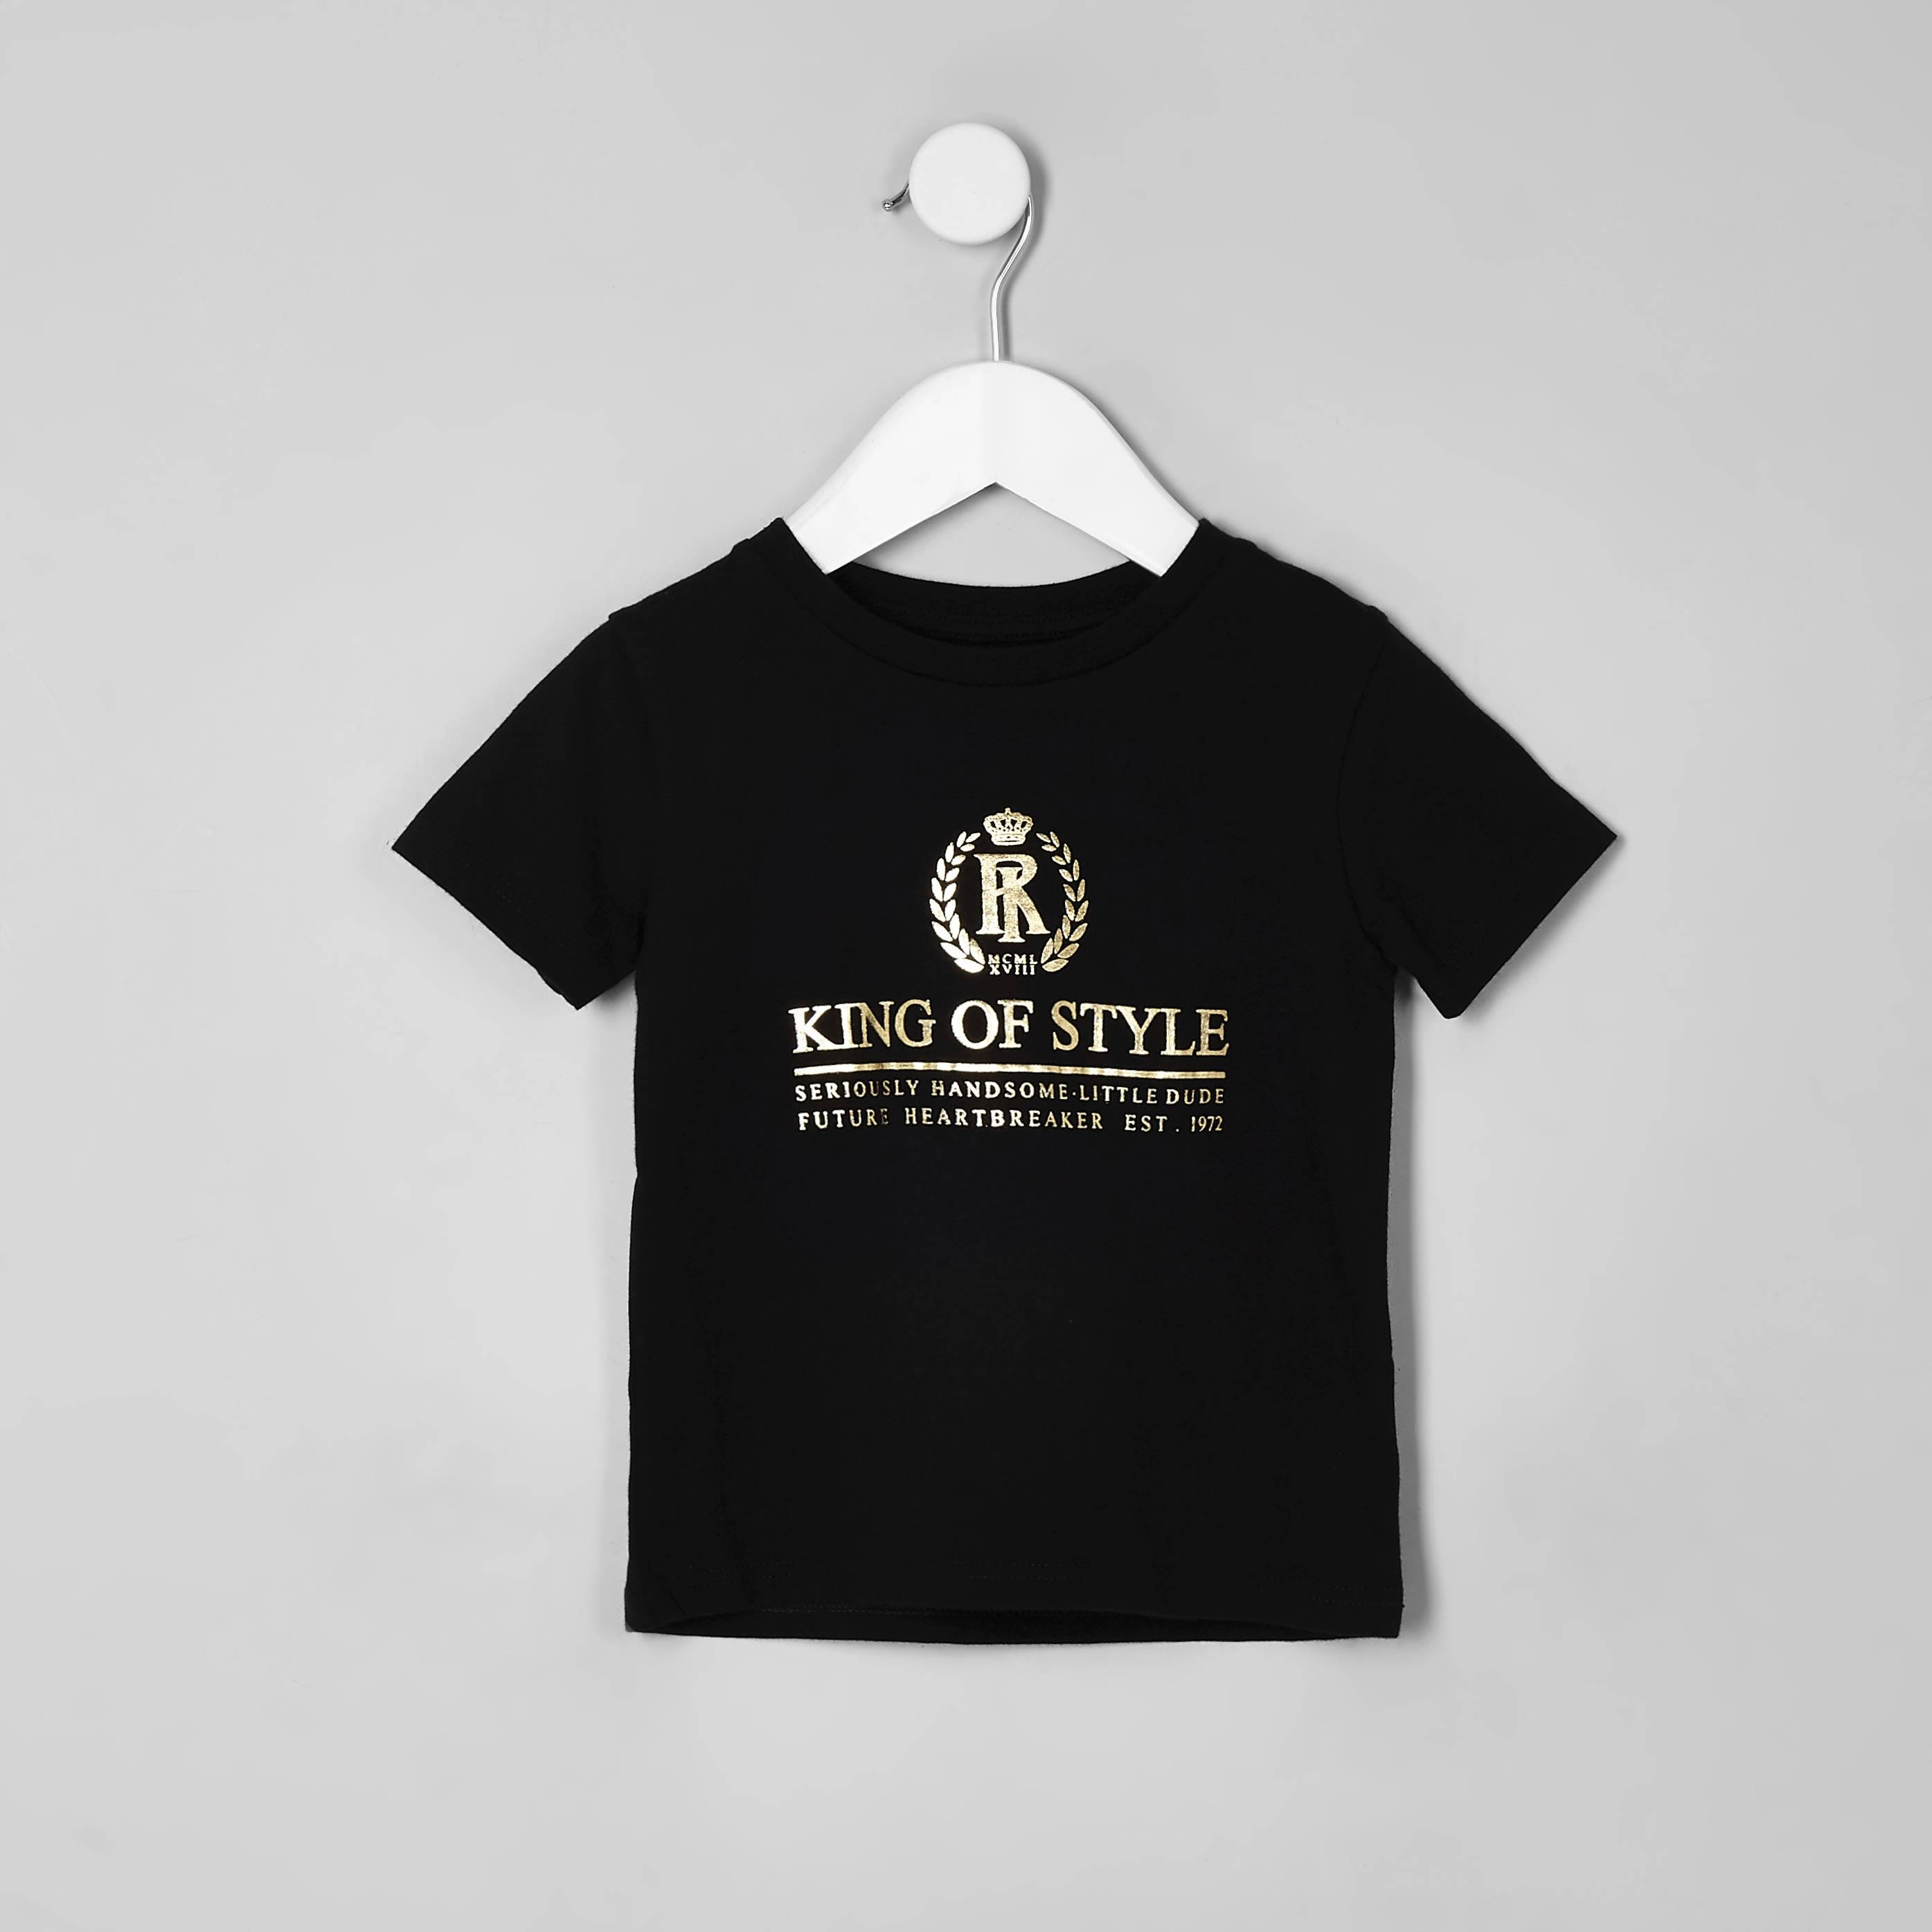 River Island Mens Baby Boys Black 'King of style' T-shirt (12-18 Mths)